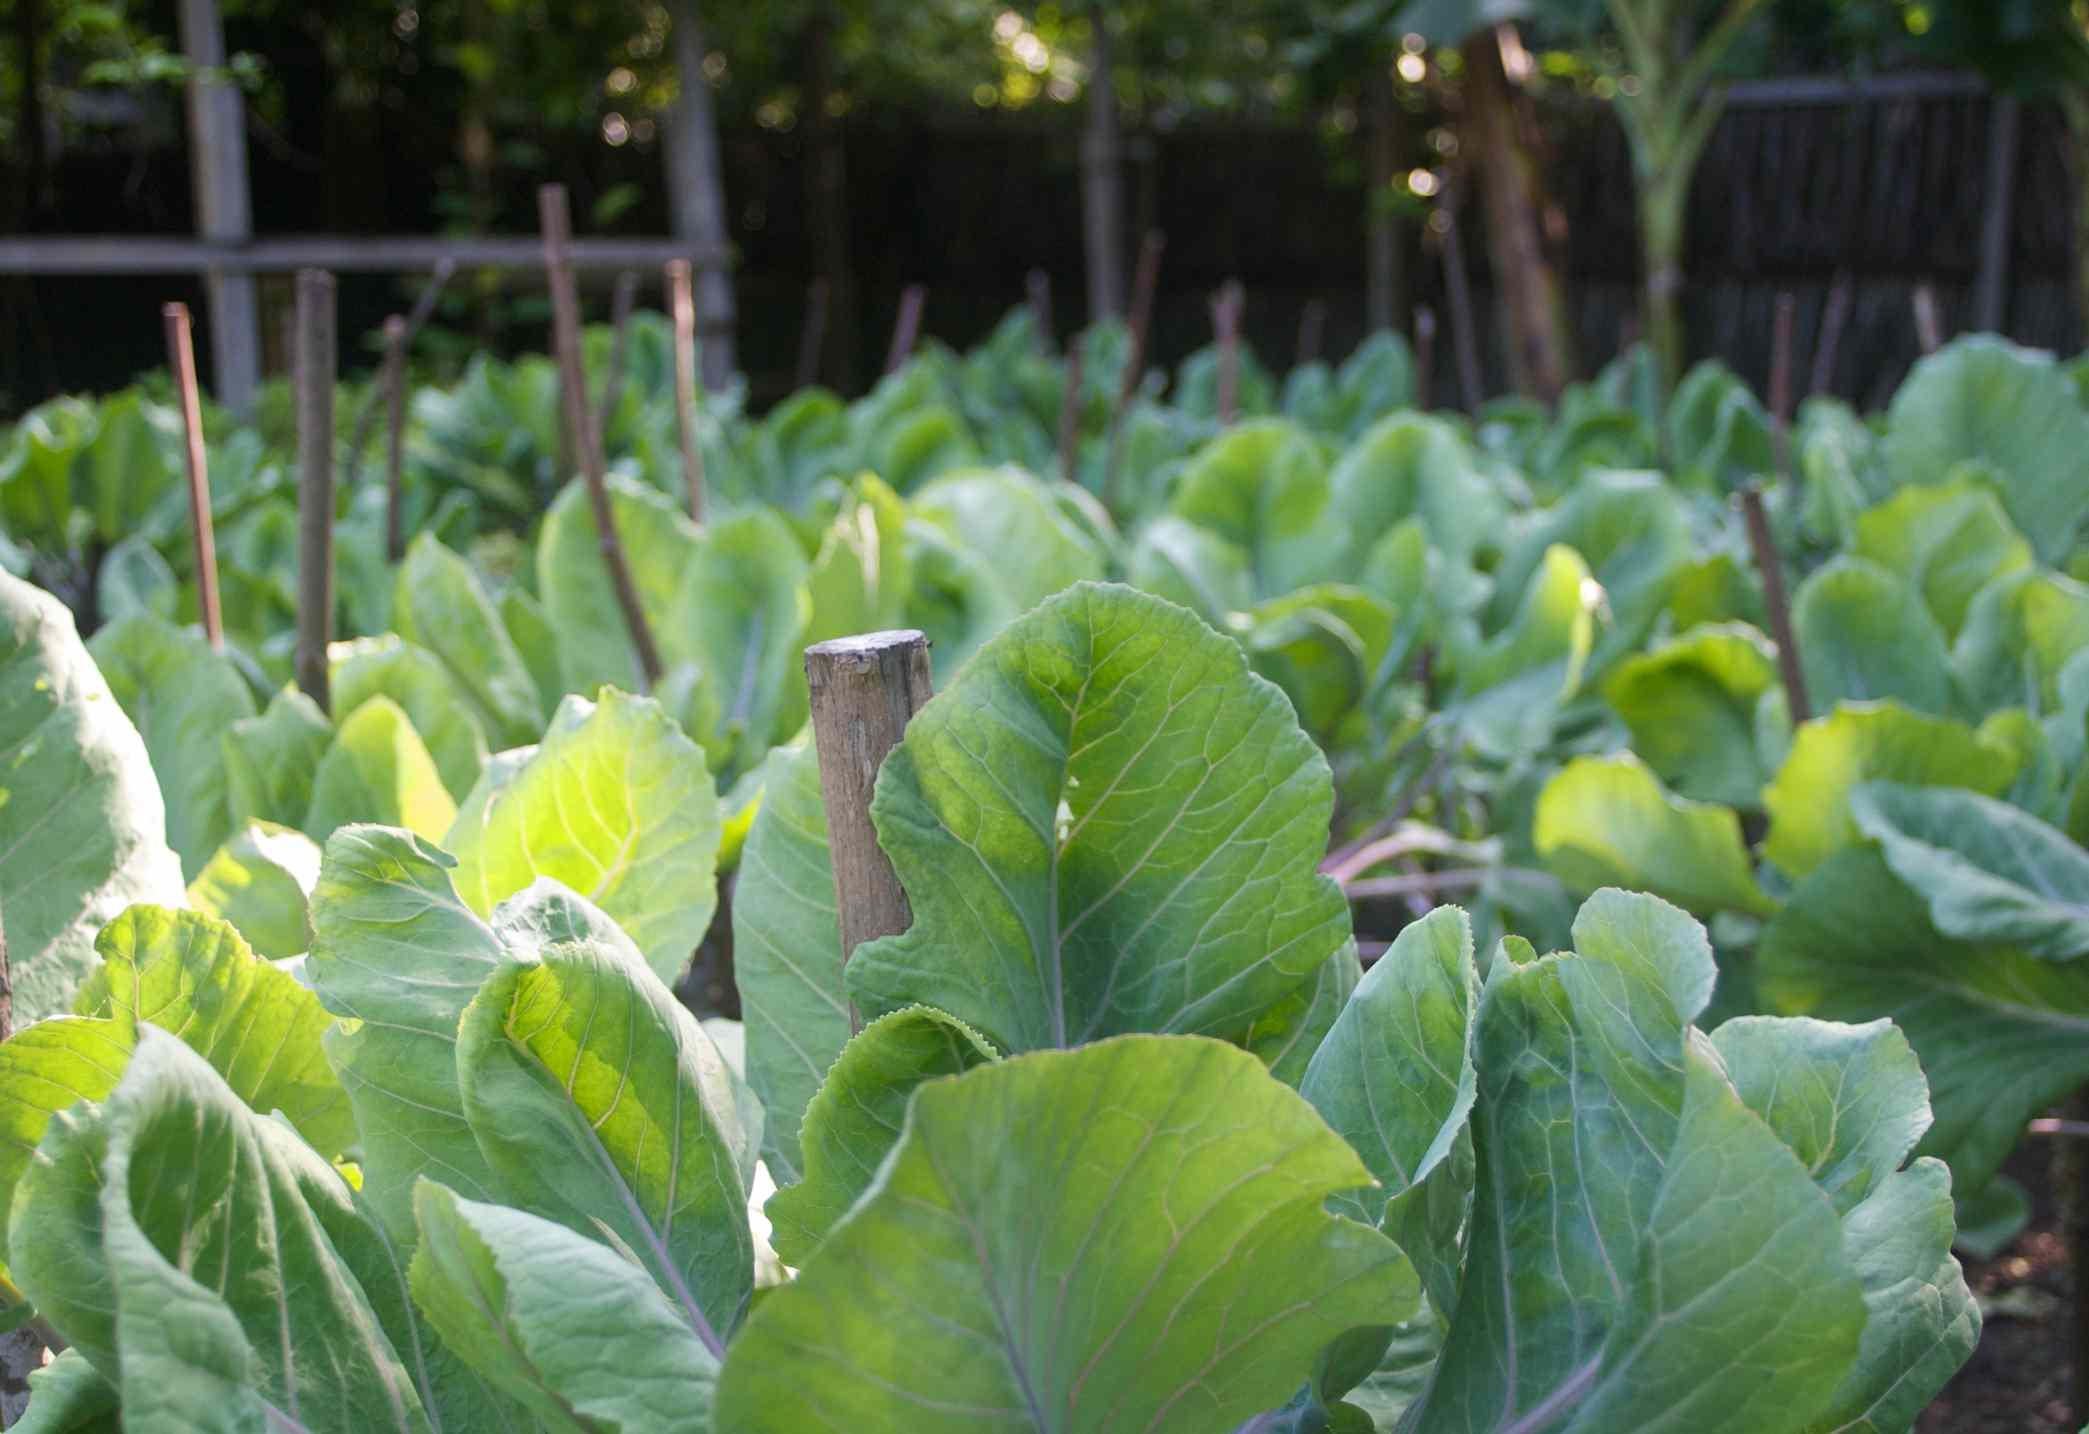 Organic garden at Soneva Fushi in the Maldives